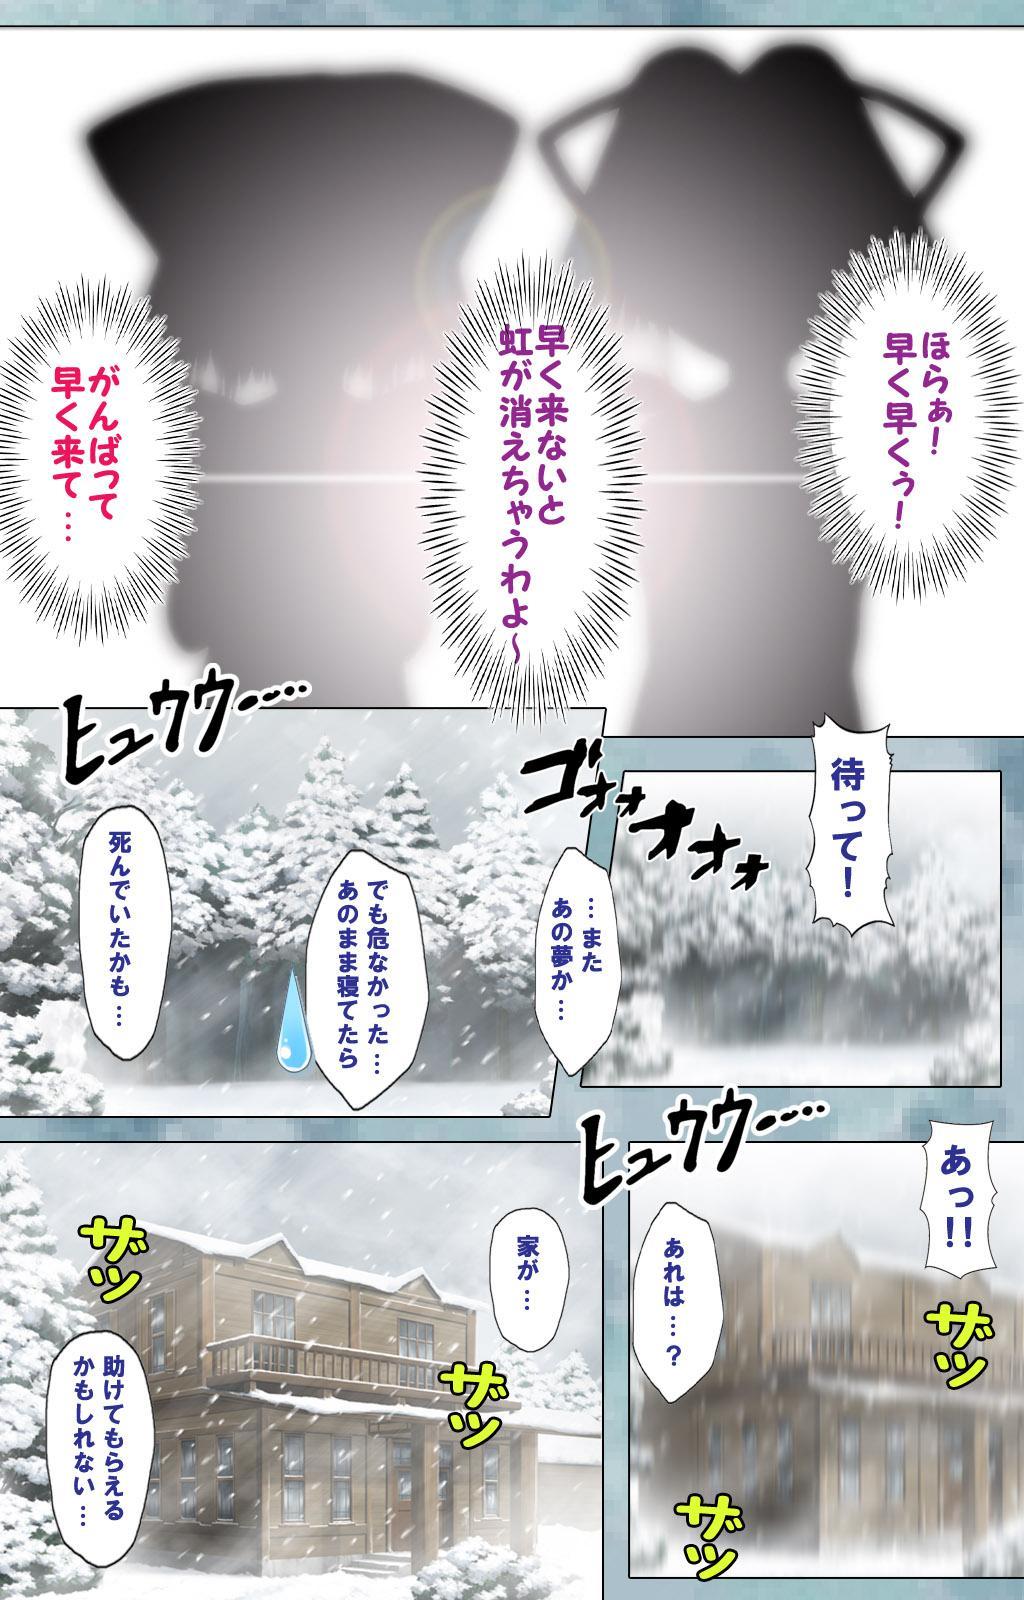 [Applemint] [Full Color seijin ban] Bijin shimai no yuwaku ~ himegoto ni oboreru otoko ~ Complete ban 2